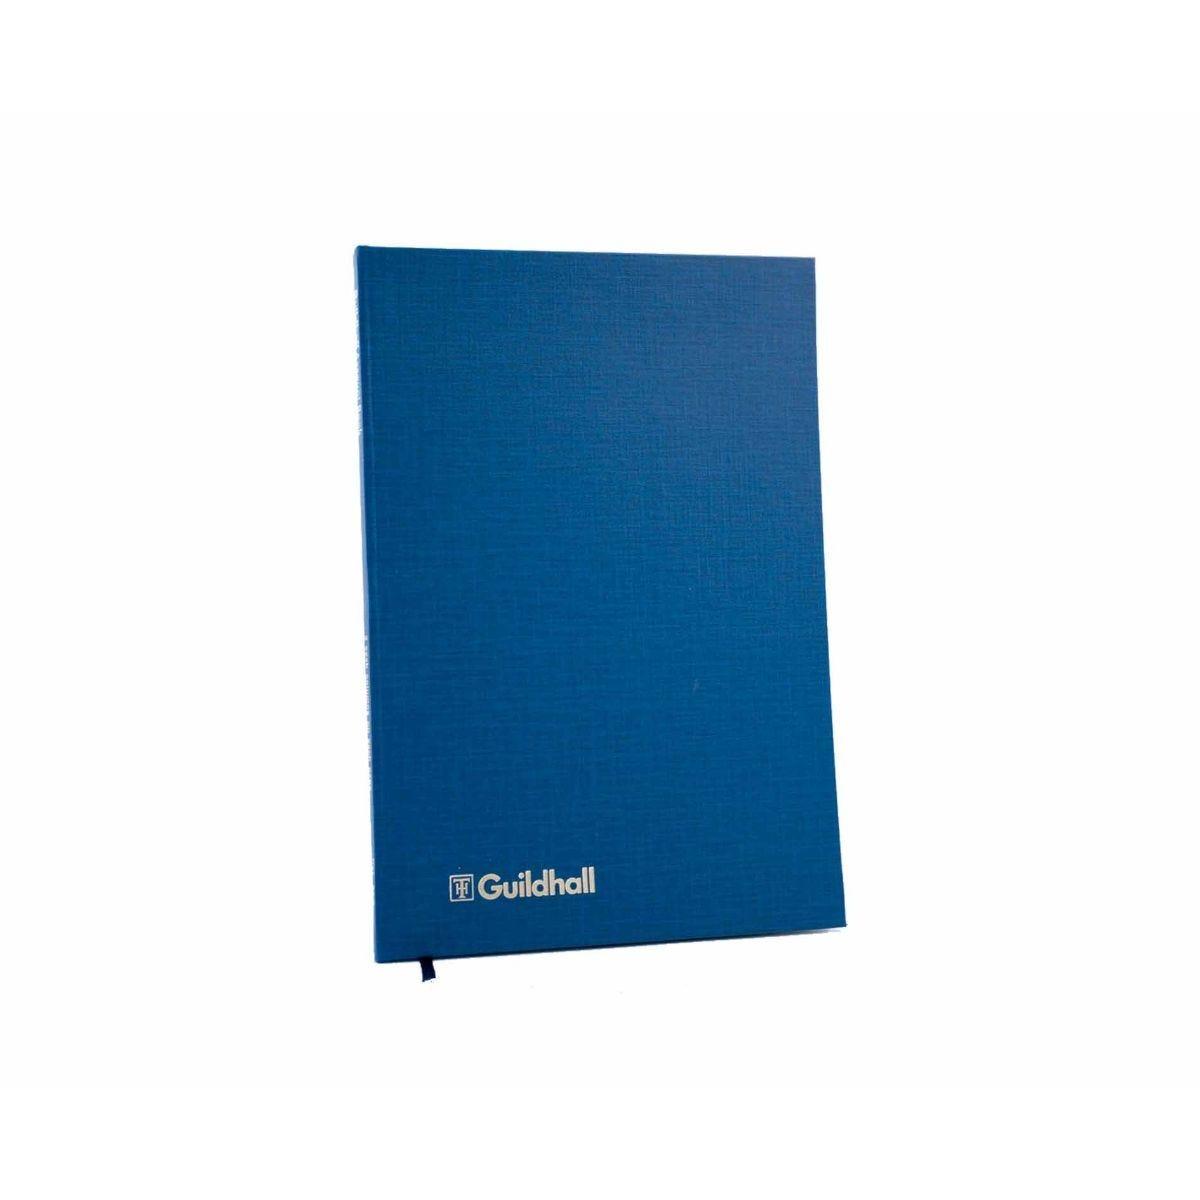 Guildhall Account Book 31 Series 8 Column A4